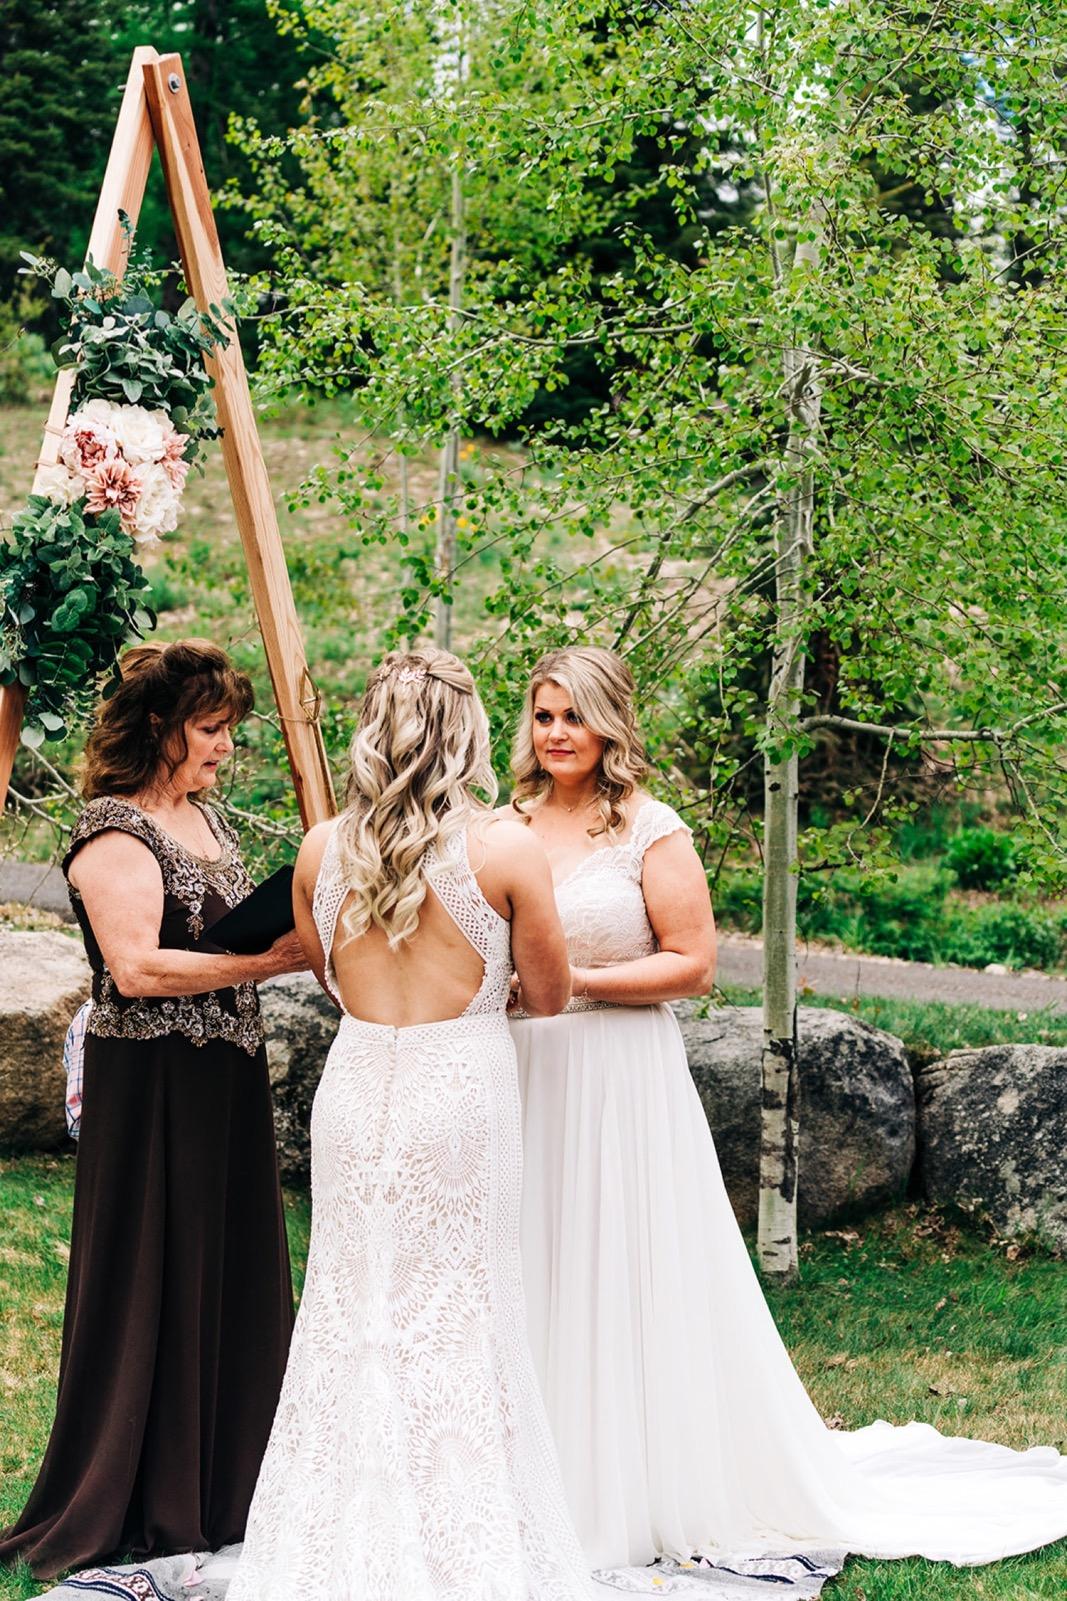 066_falissa_heather_wedding-164.jpg